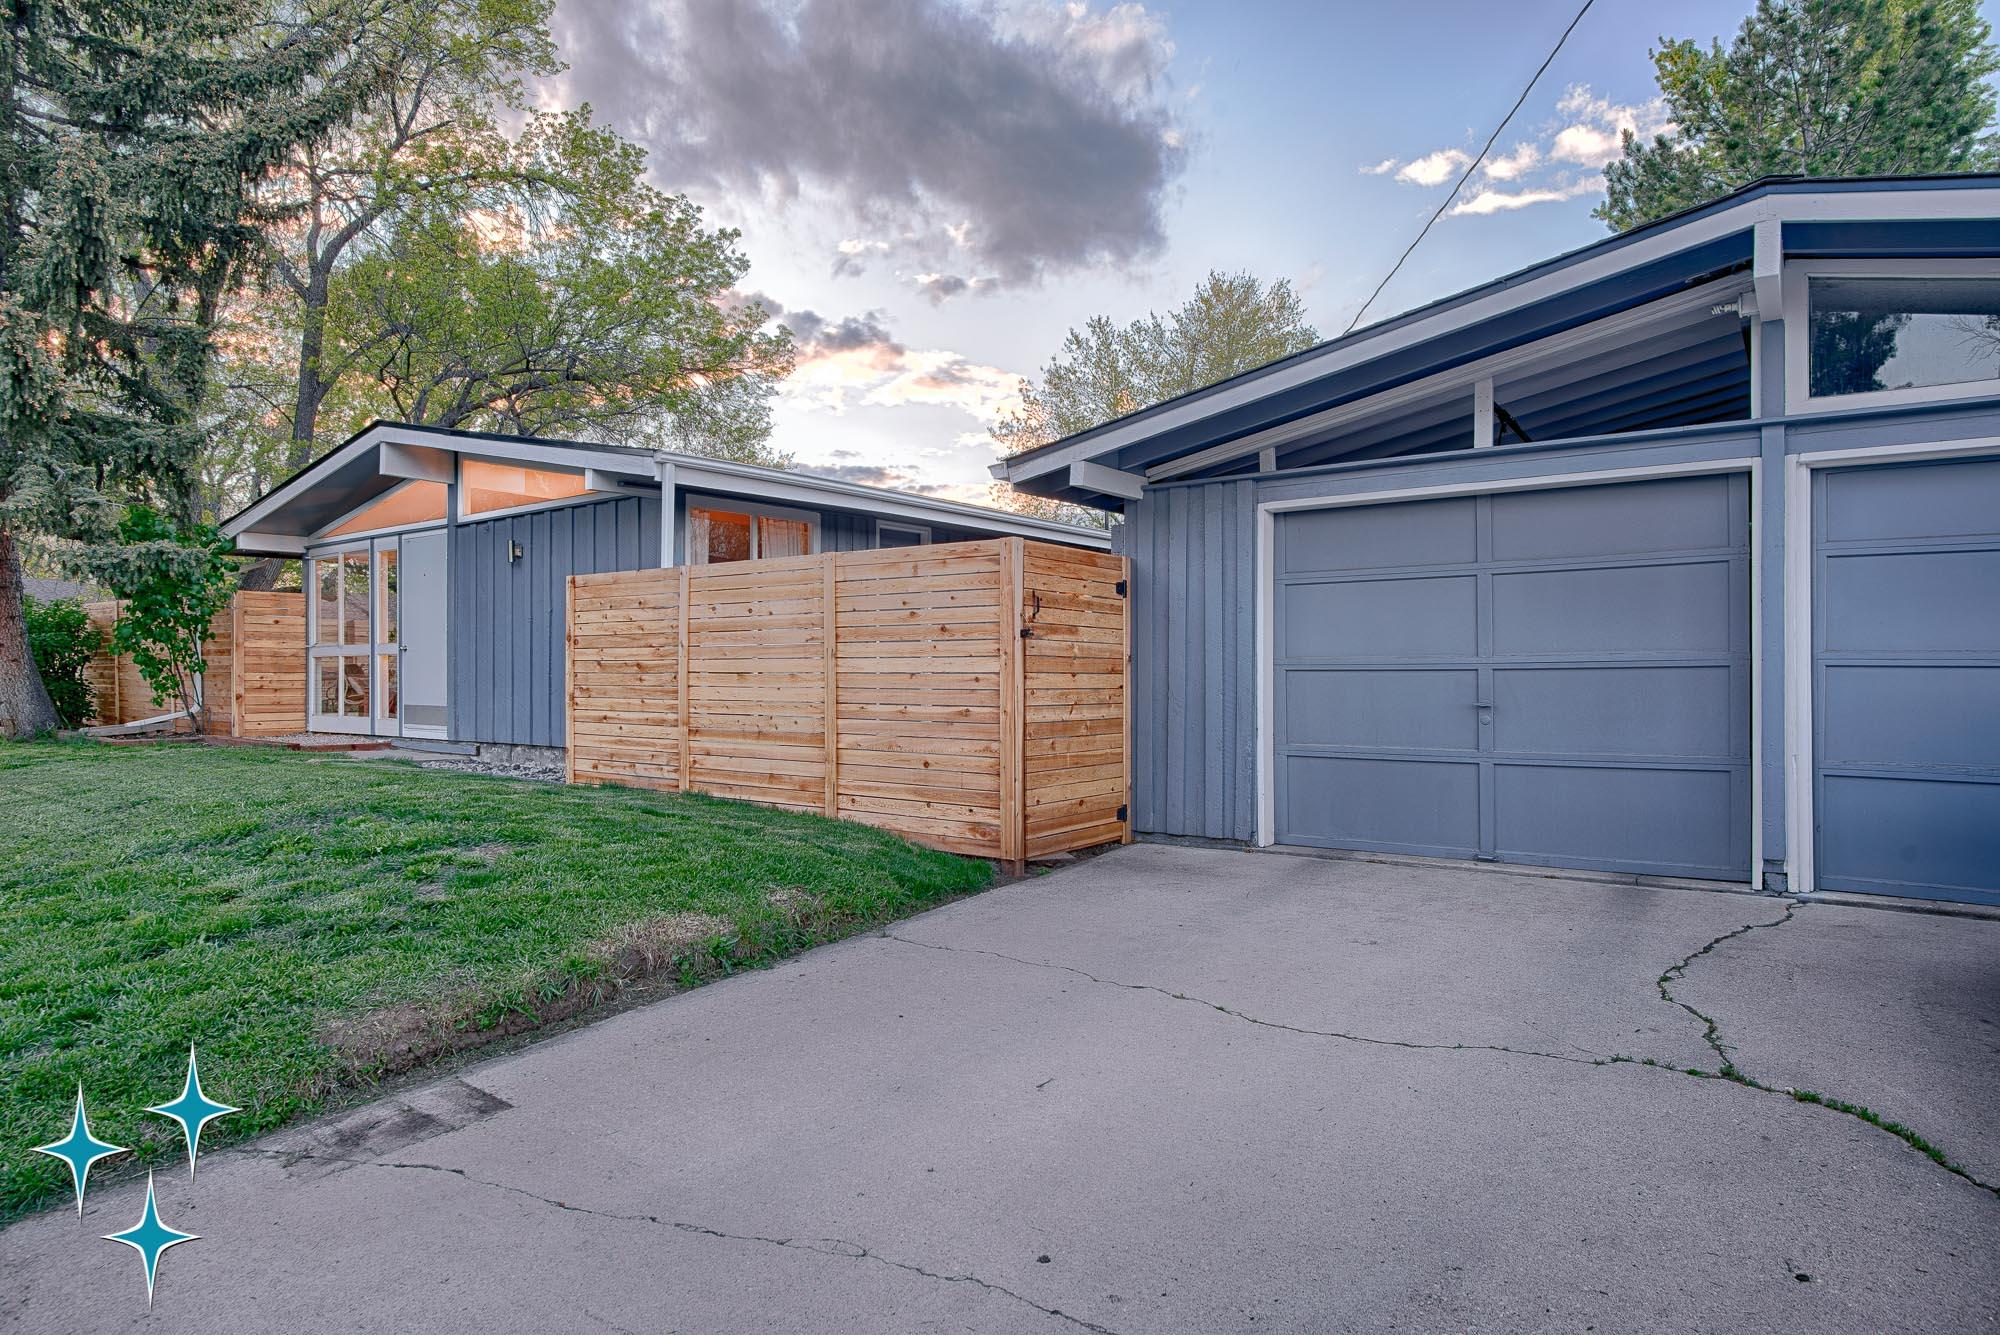 Adrian-Kinney-2596-S-Osceola-Street-Denver-Cliff-May-Harvey-Park-2000w50-3SWM-30.jpg